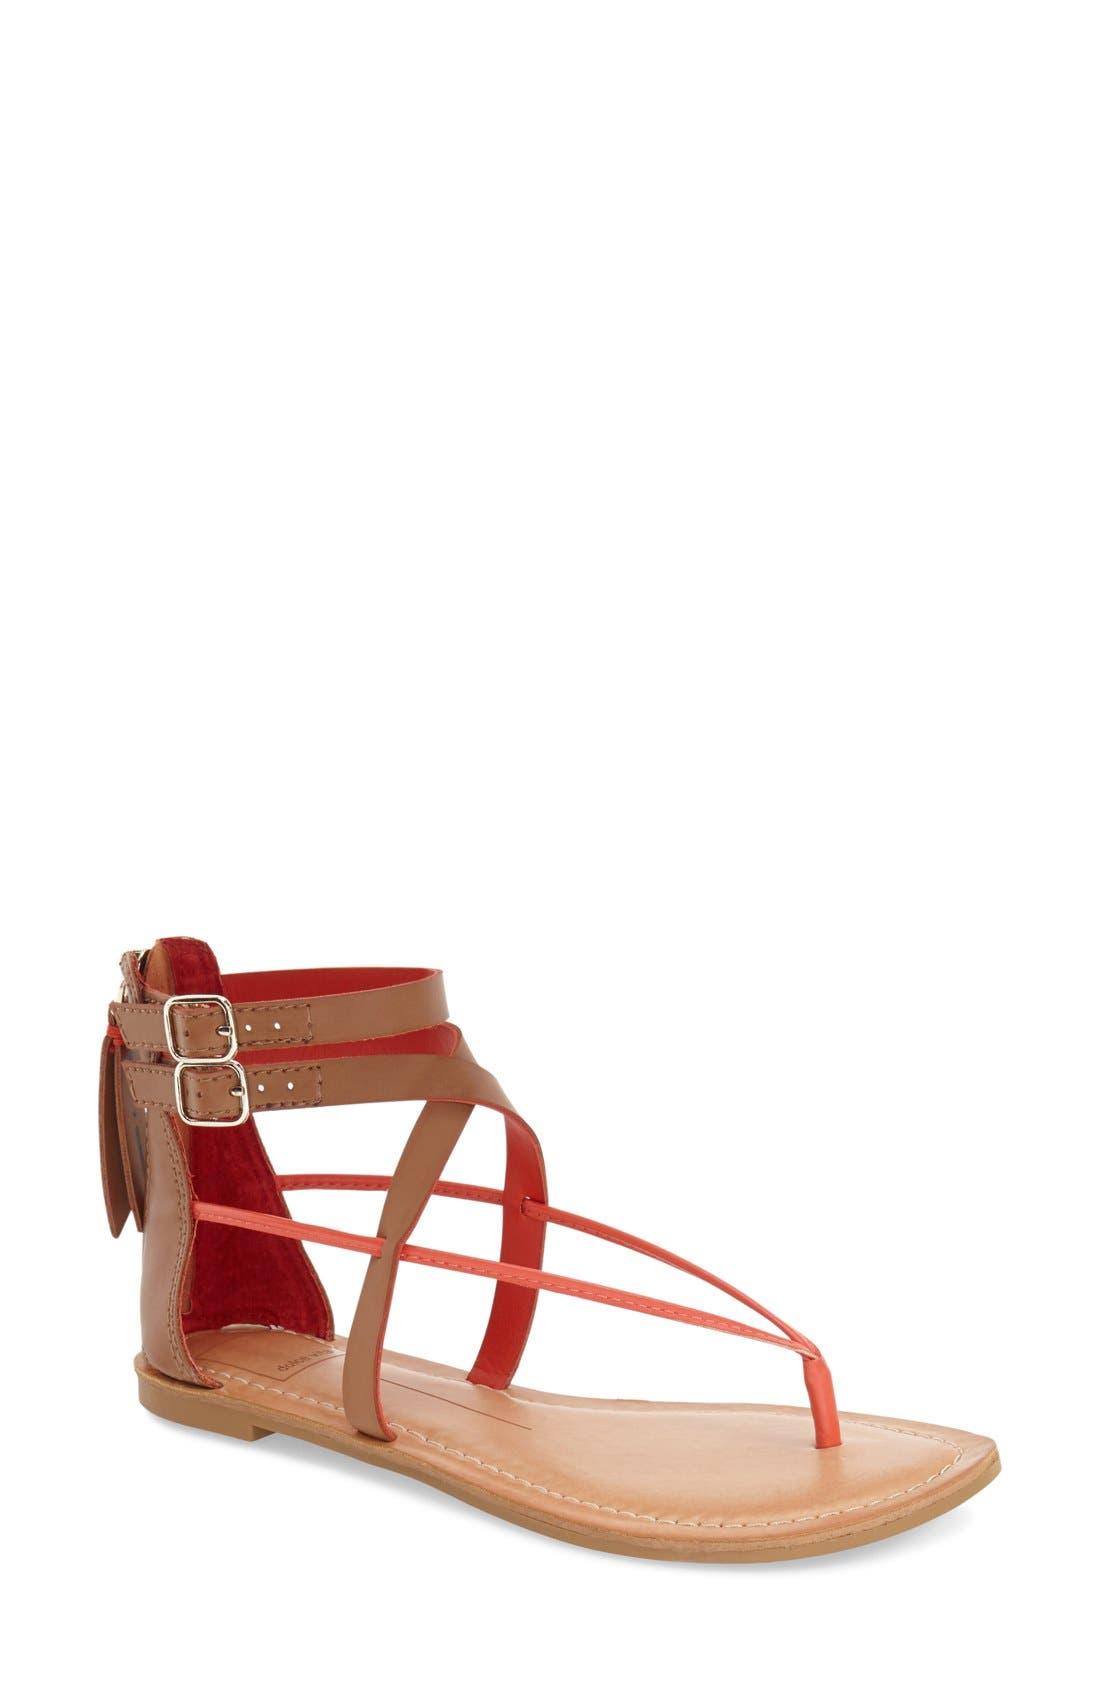 Main Image - Dolce Vita 'Darrah' Sandal (Women)